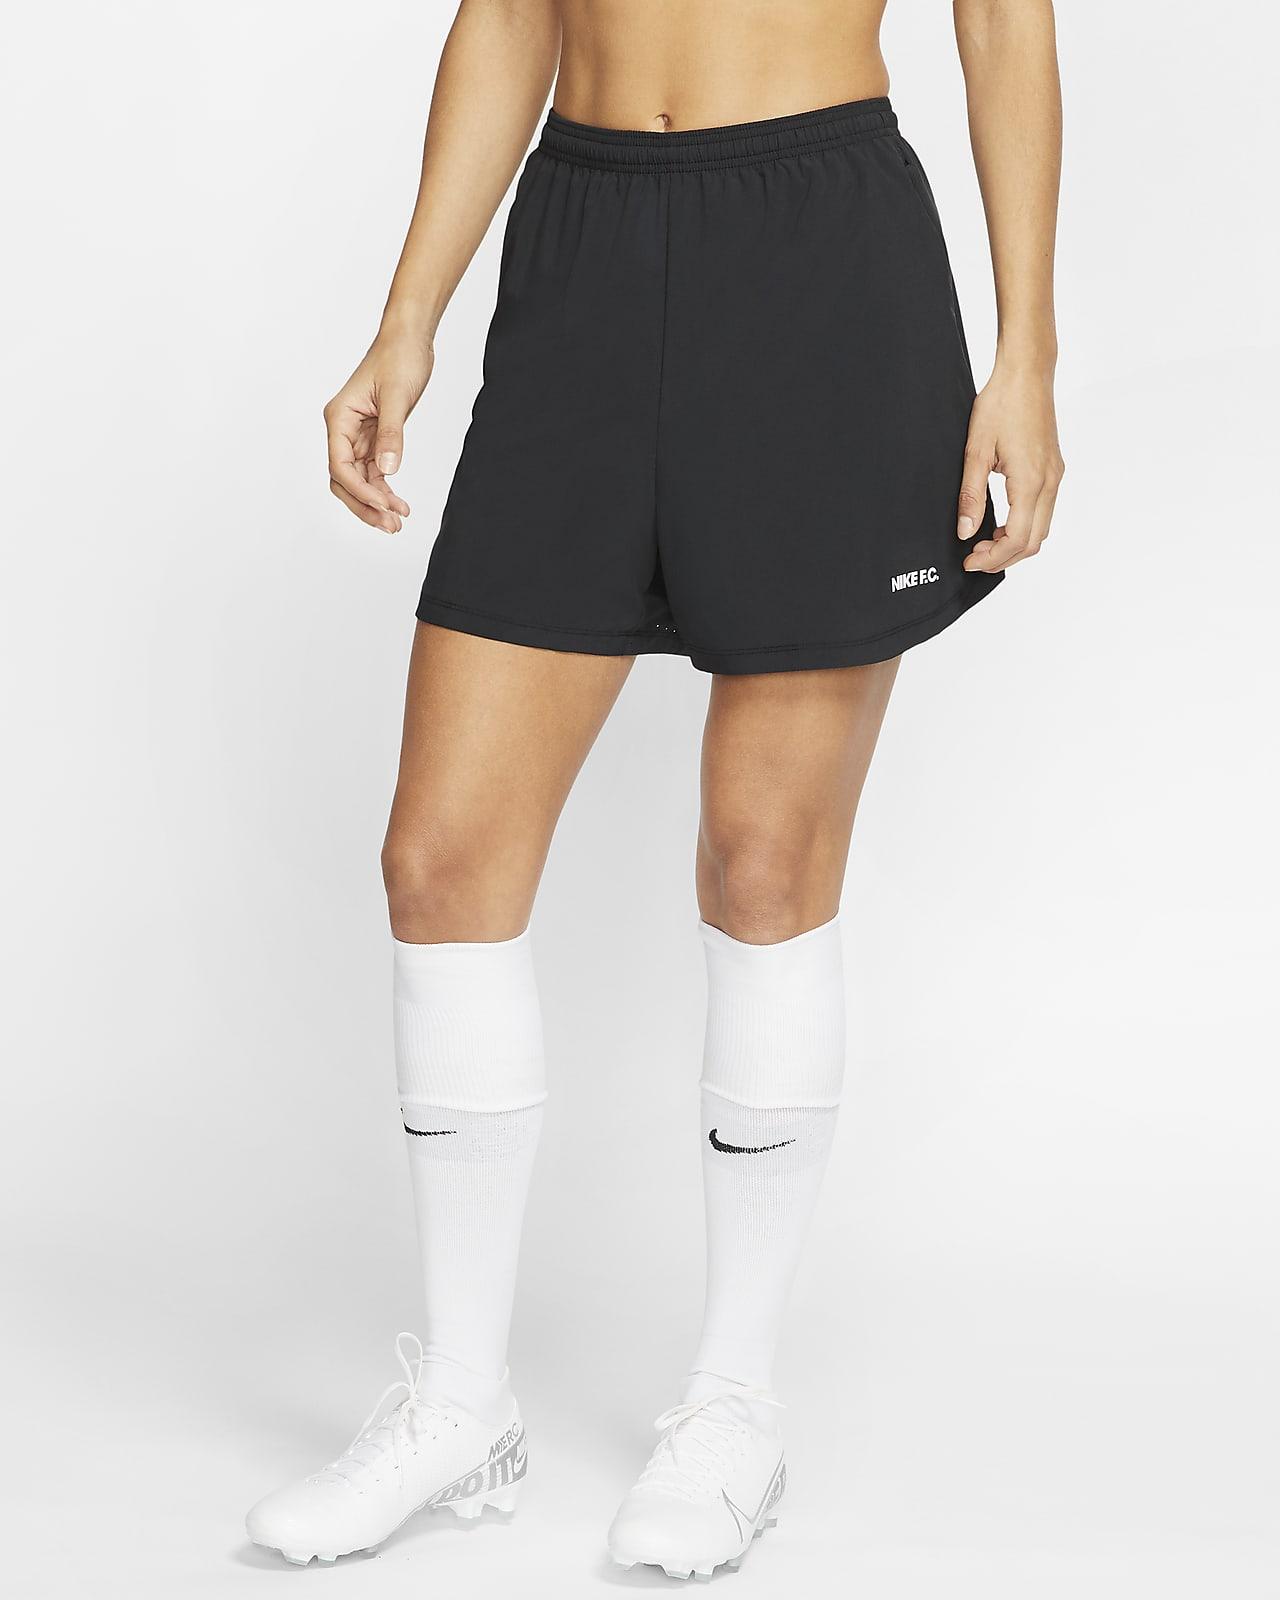 Nike F.C. Women's Soccer Shorts